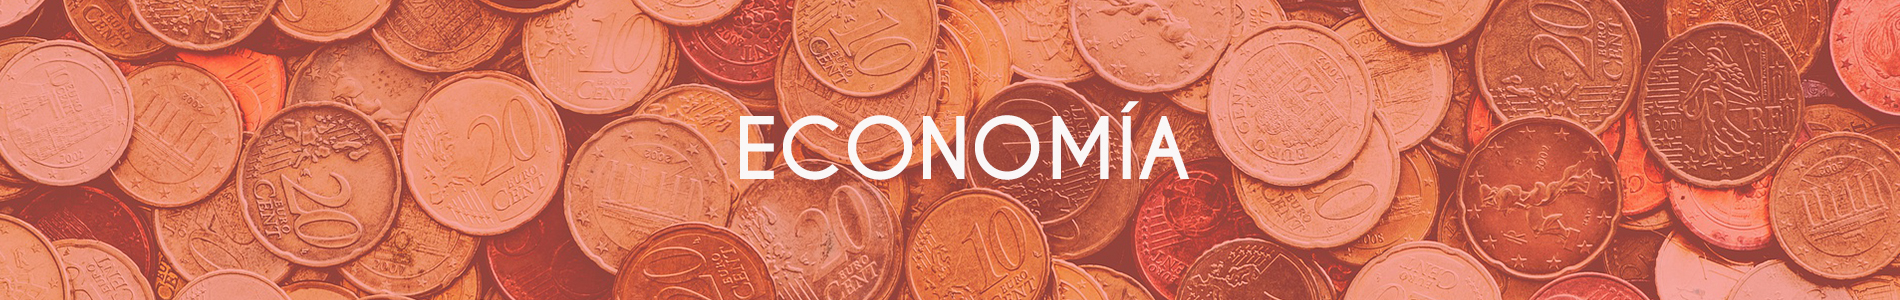 banner-economía-1900x300